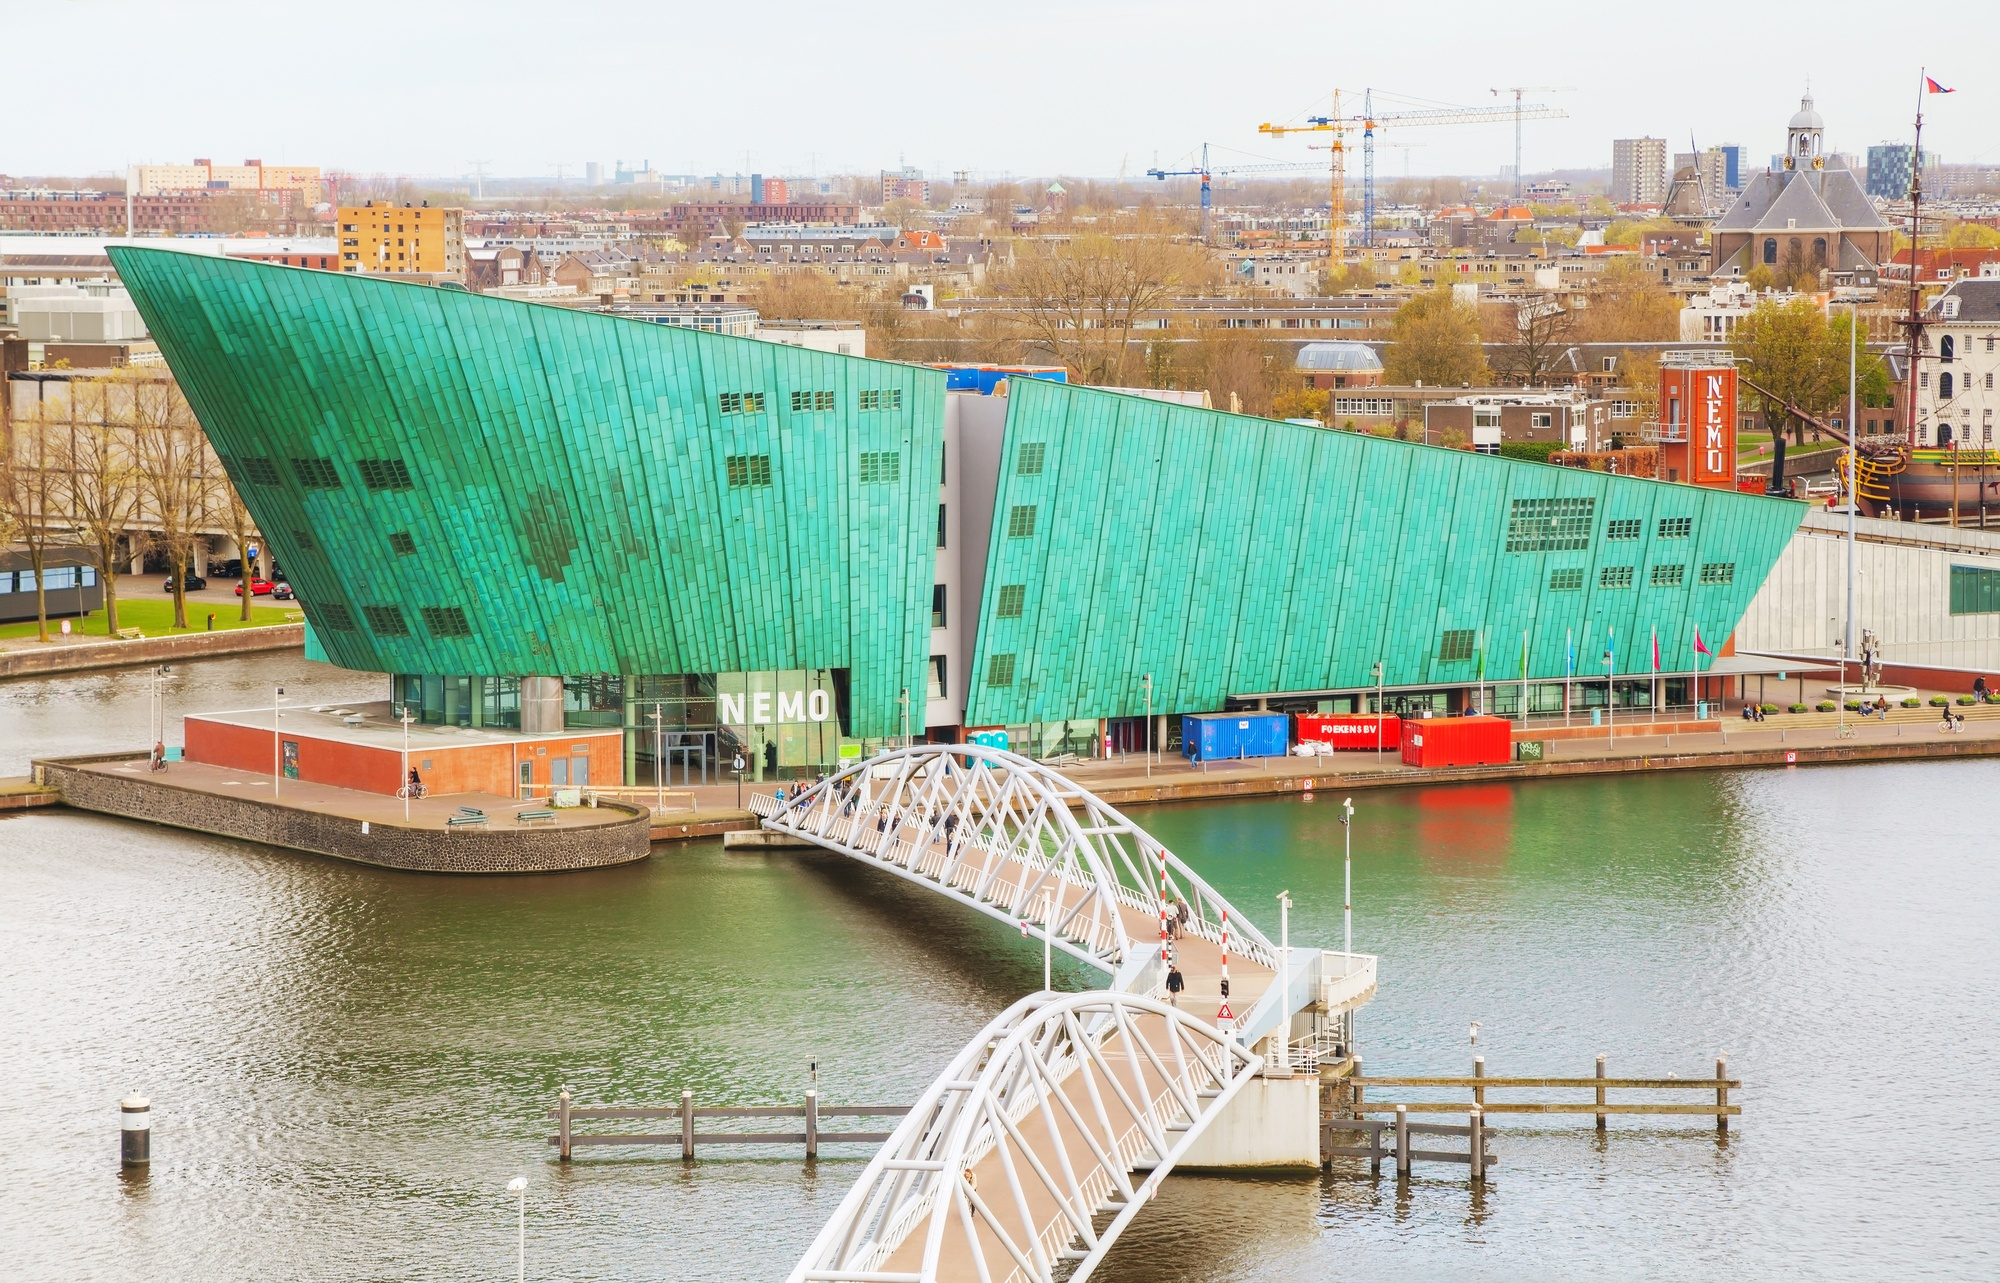 Science Center NEMO in Amsterdam, the Netherlands